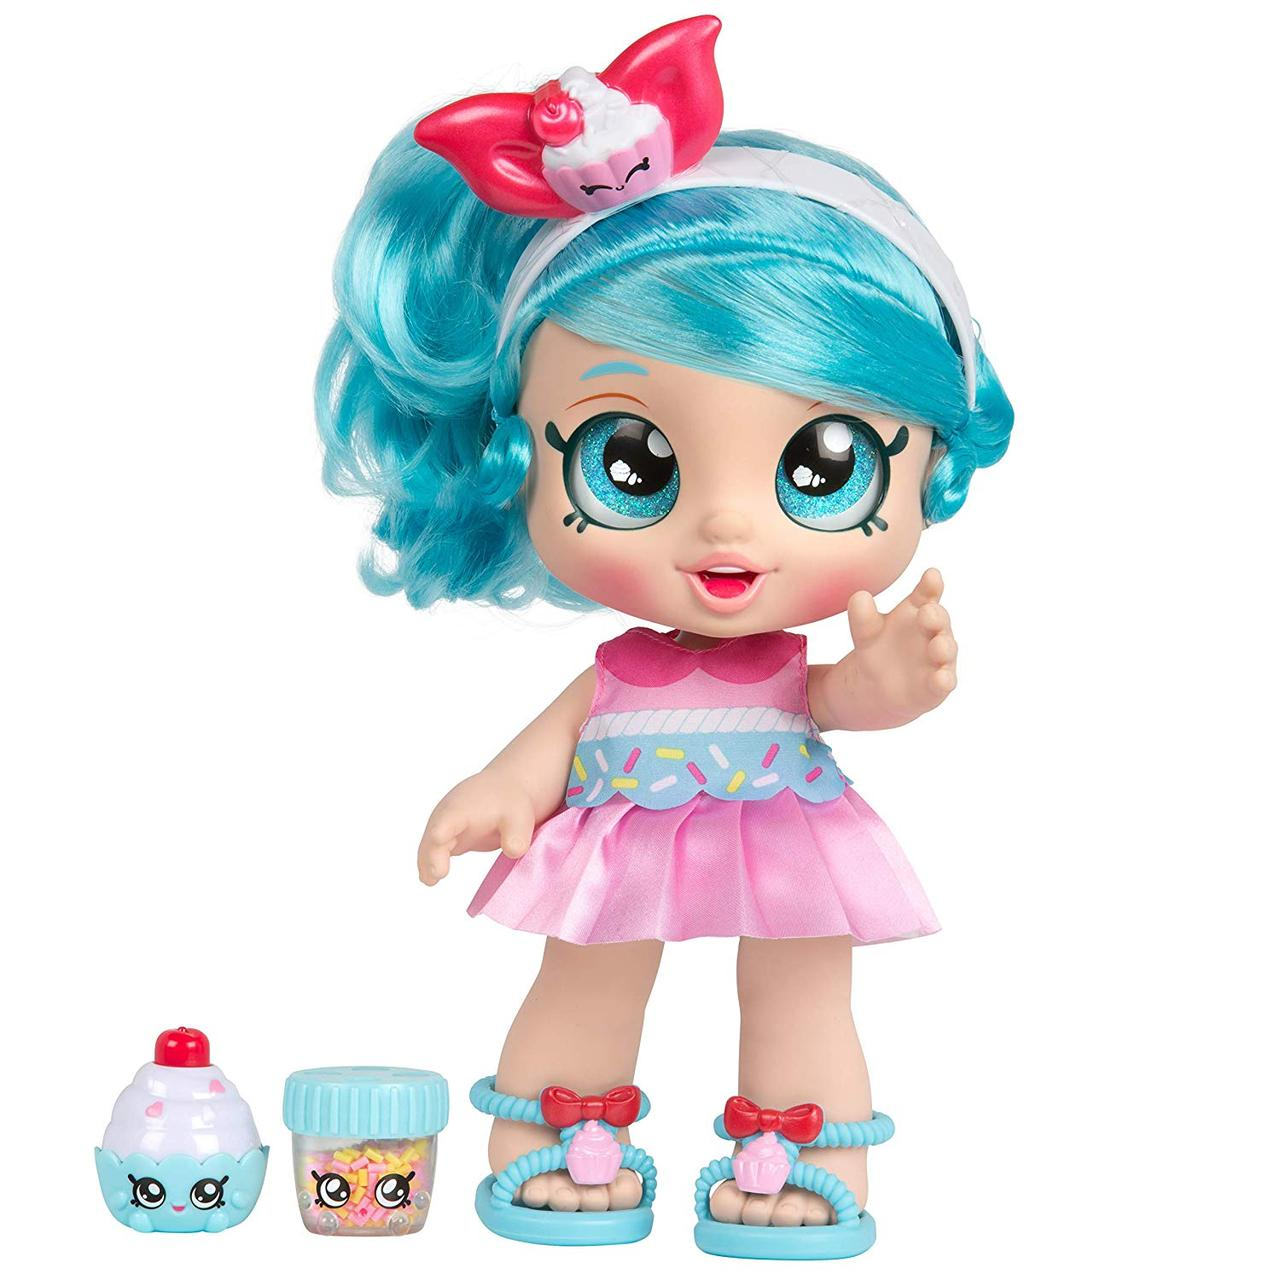 Kindi Kids Кукла пупс Джессикейк время друзей перекусить Jessicake Snack Time Friends Pre-School 26 см